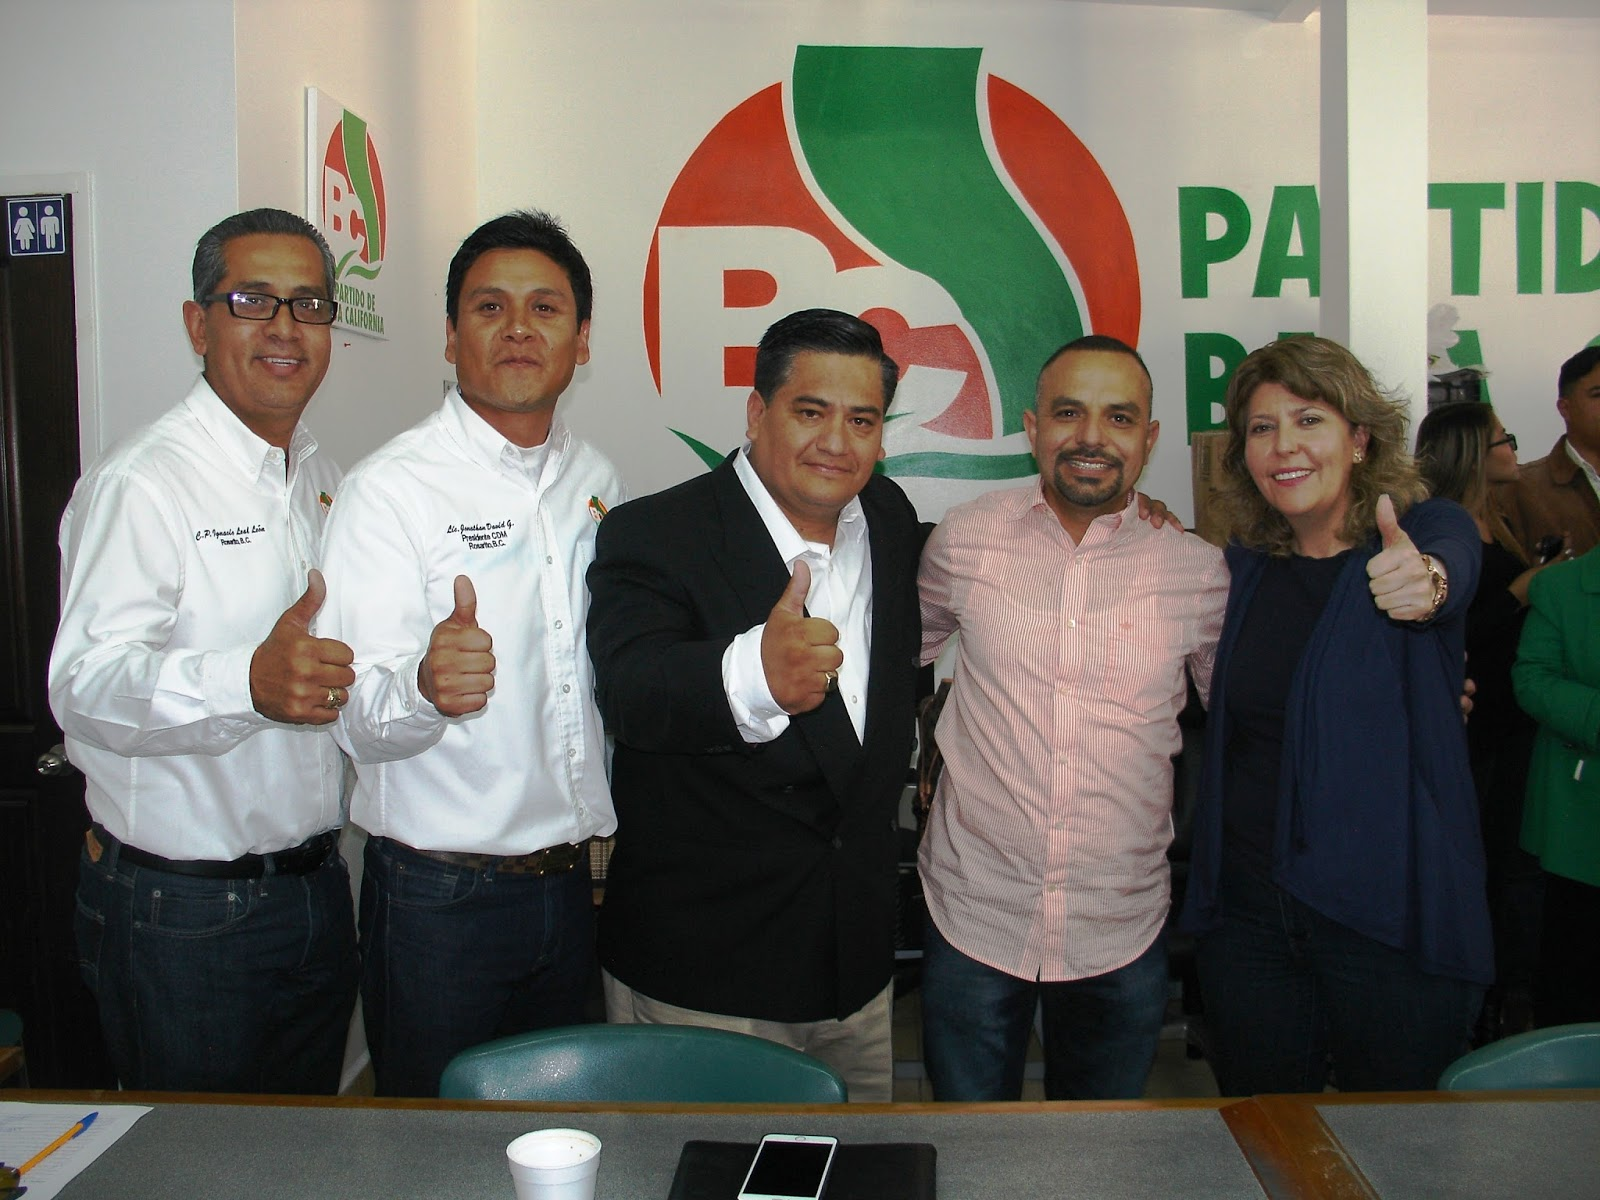 Resultado de imagen para Raúl Paredes Esquer, PLAYAS DE ROSARITO